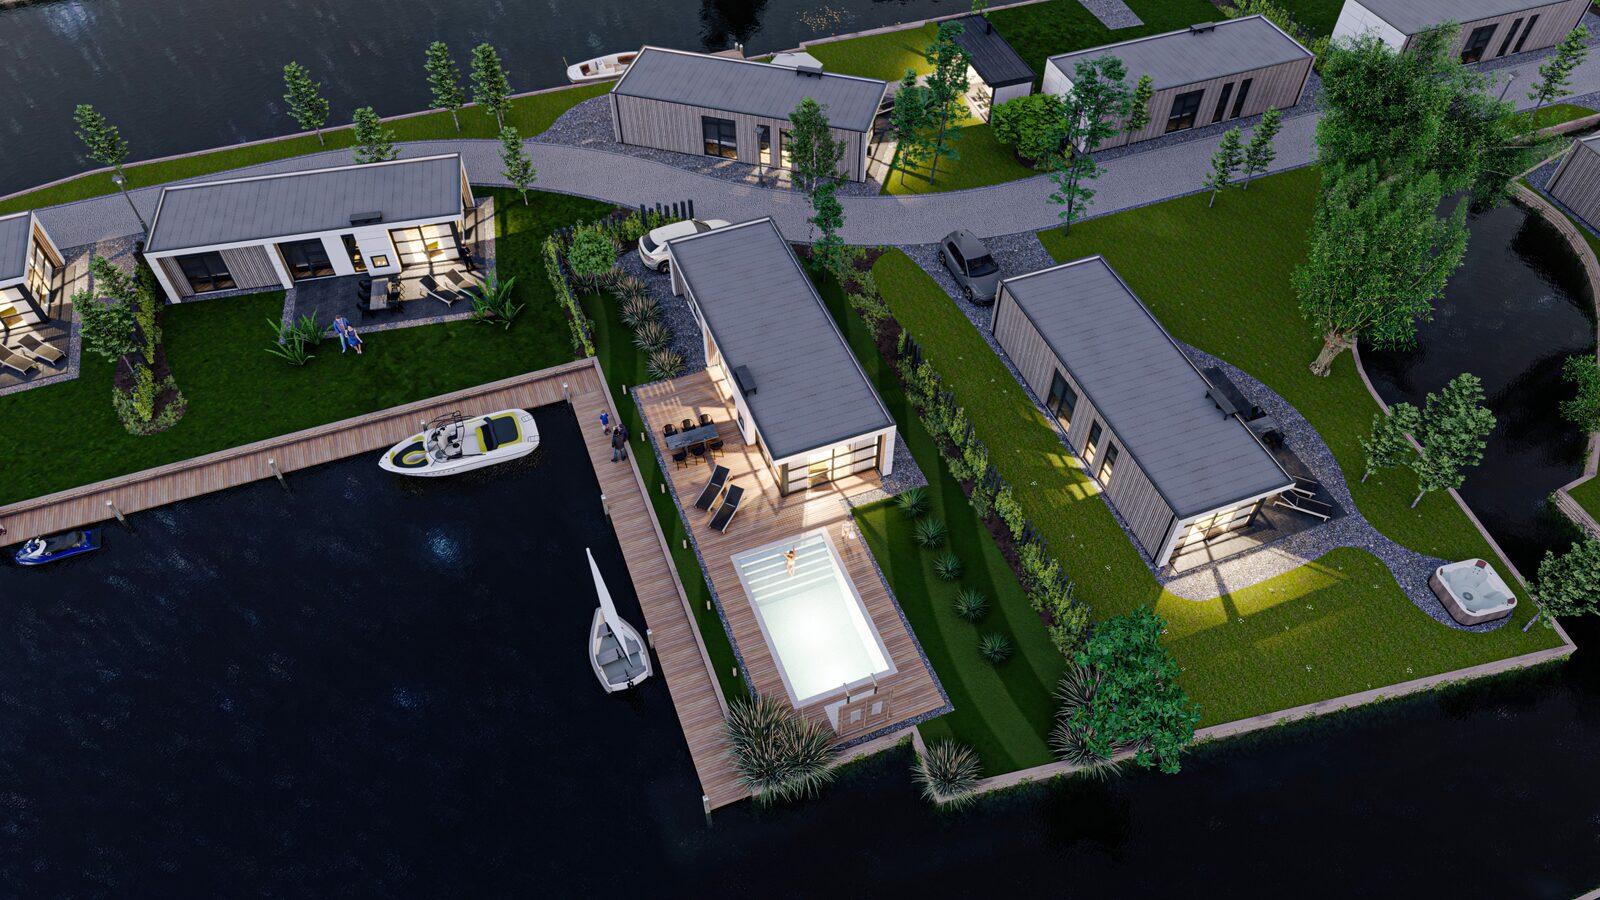 MarinaPark Residentie Nieuw Loosdrecht